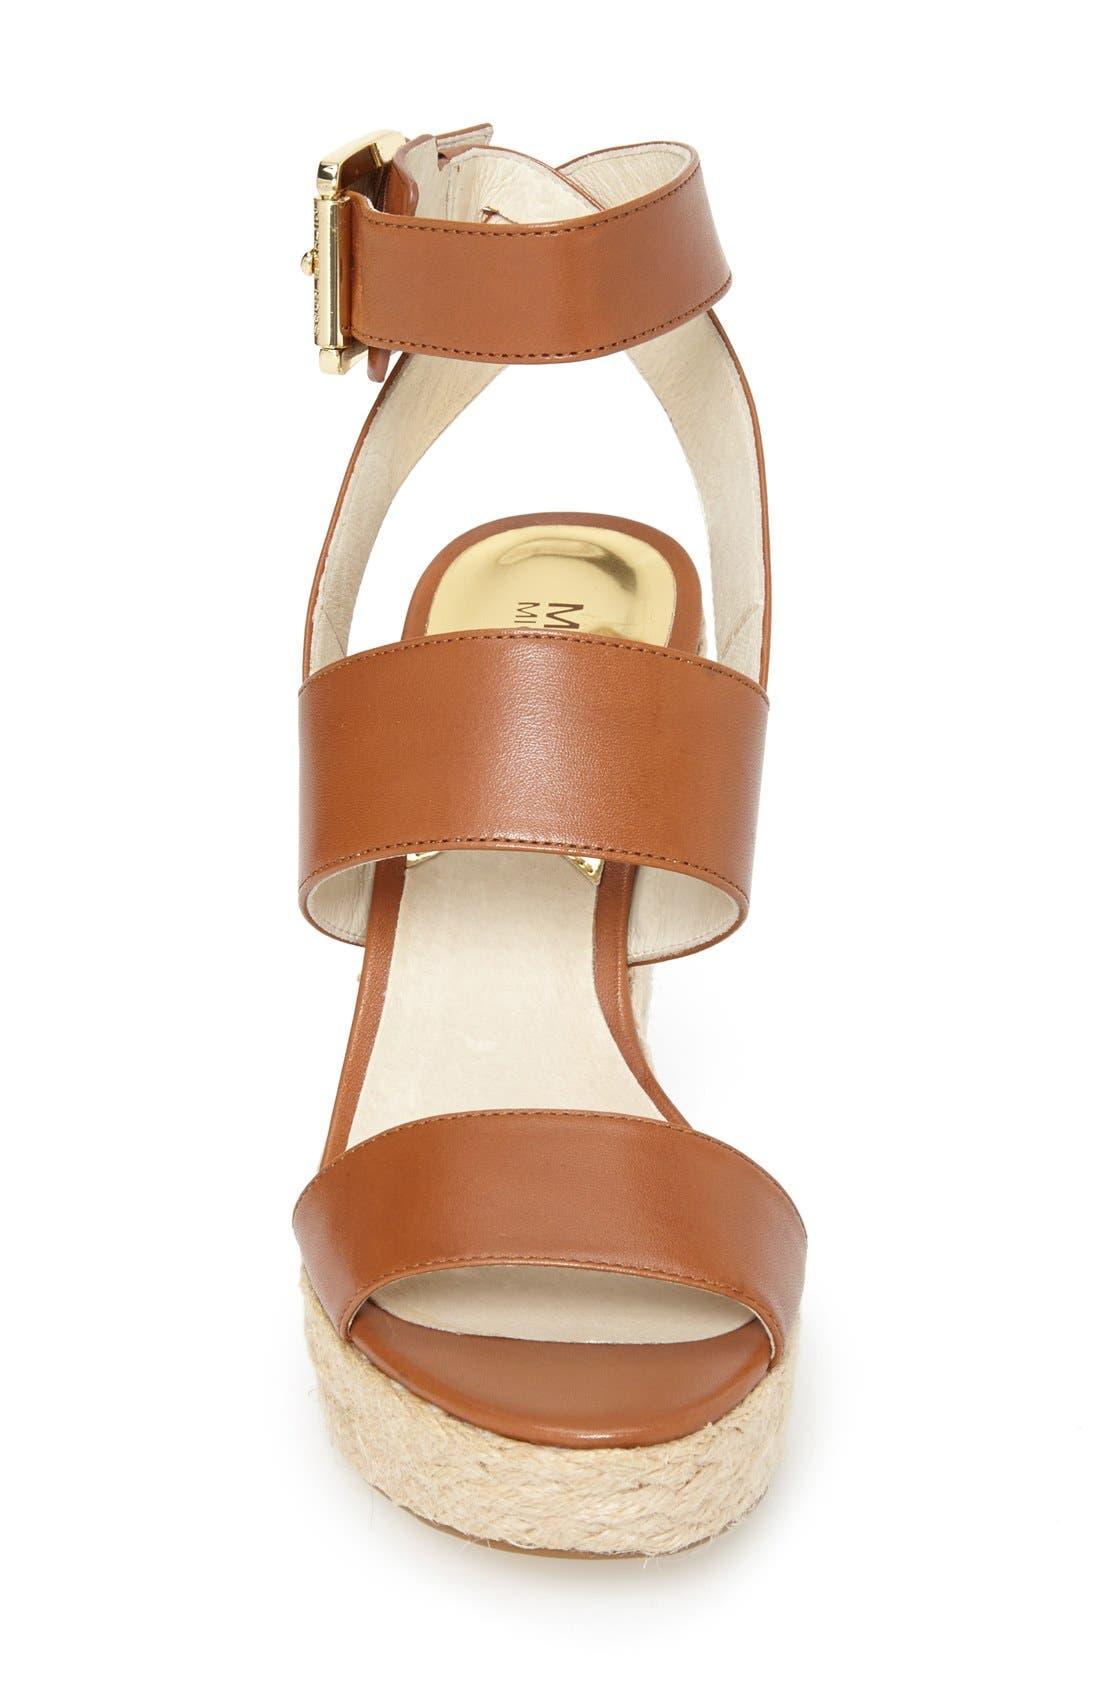 Alternate Image 3  - MICHAEL Michael Kors 'Posey' Ankle Strap Espadrille Wedge Sandal (Women)